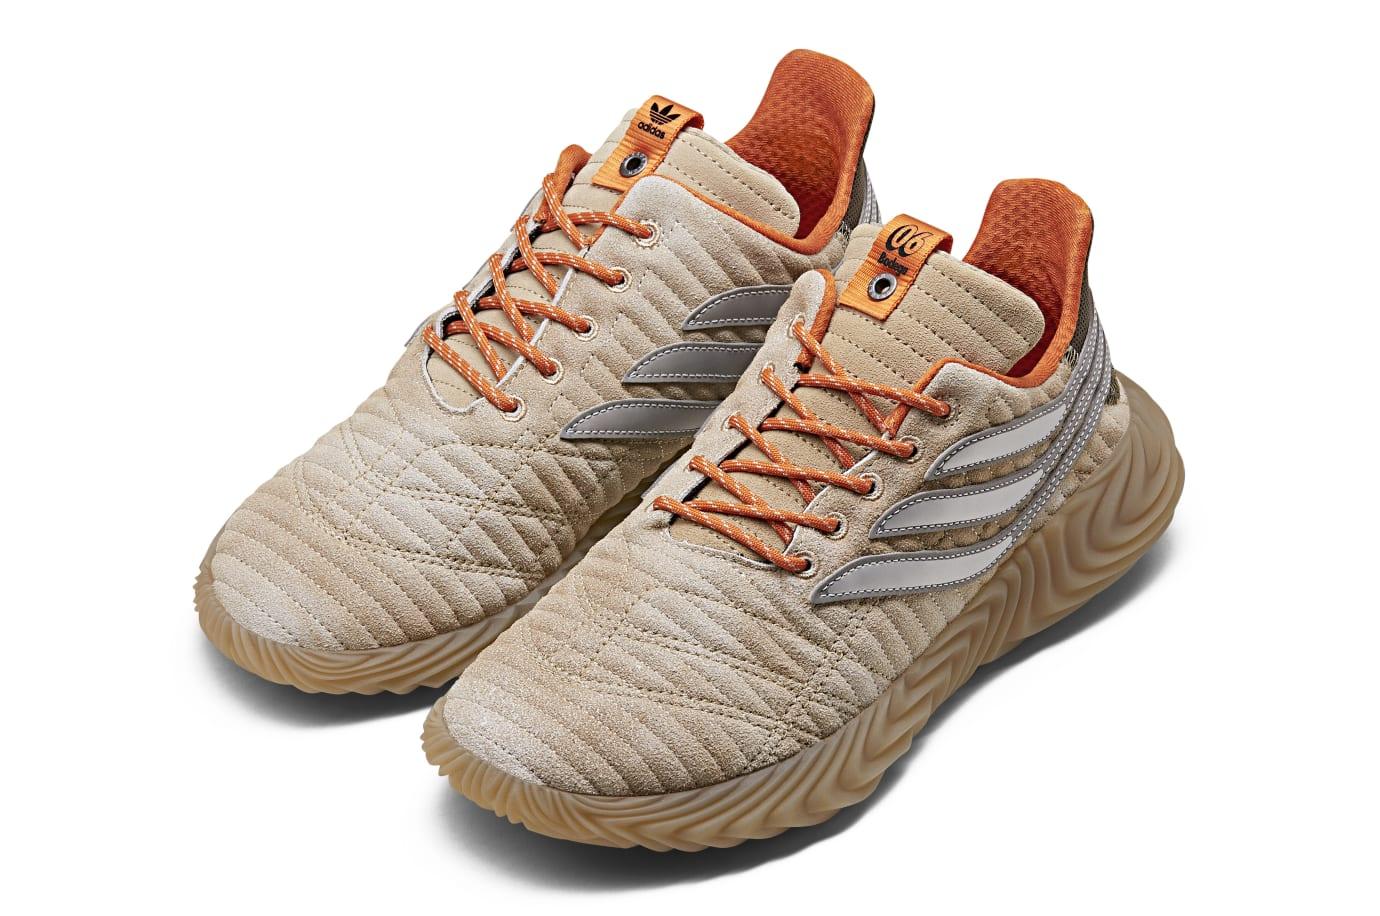 Bodega x Adidas Sobakov BC0818 (Pair)